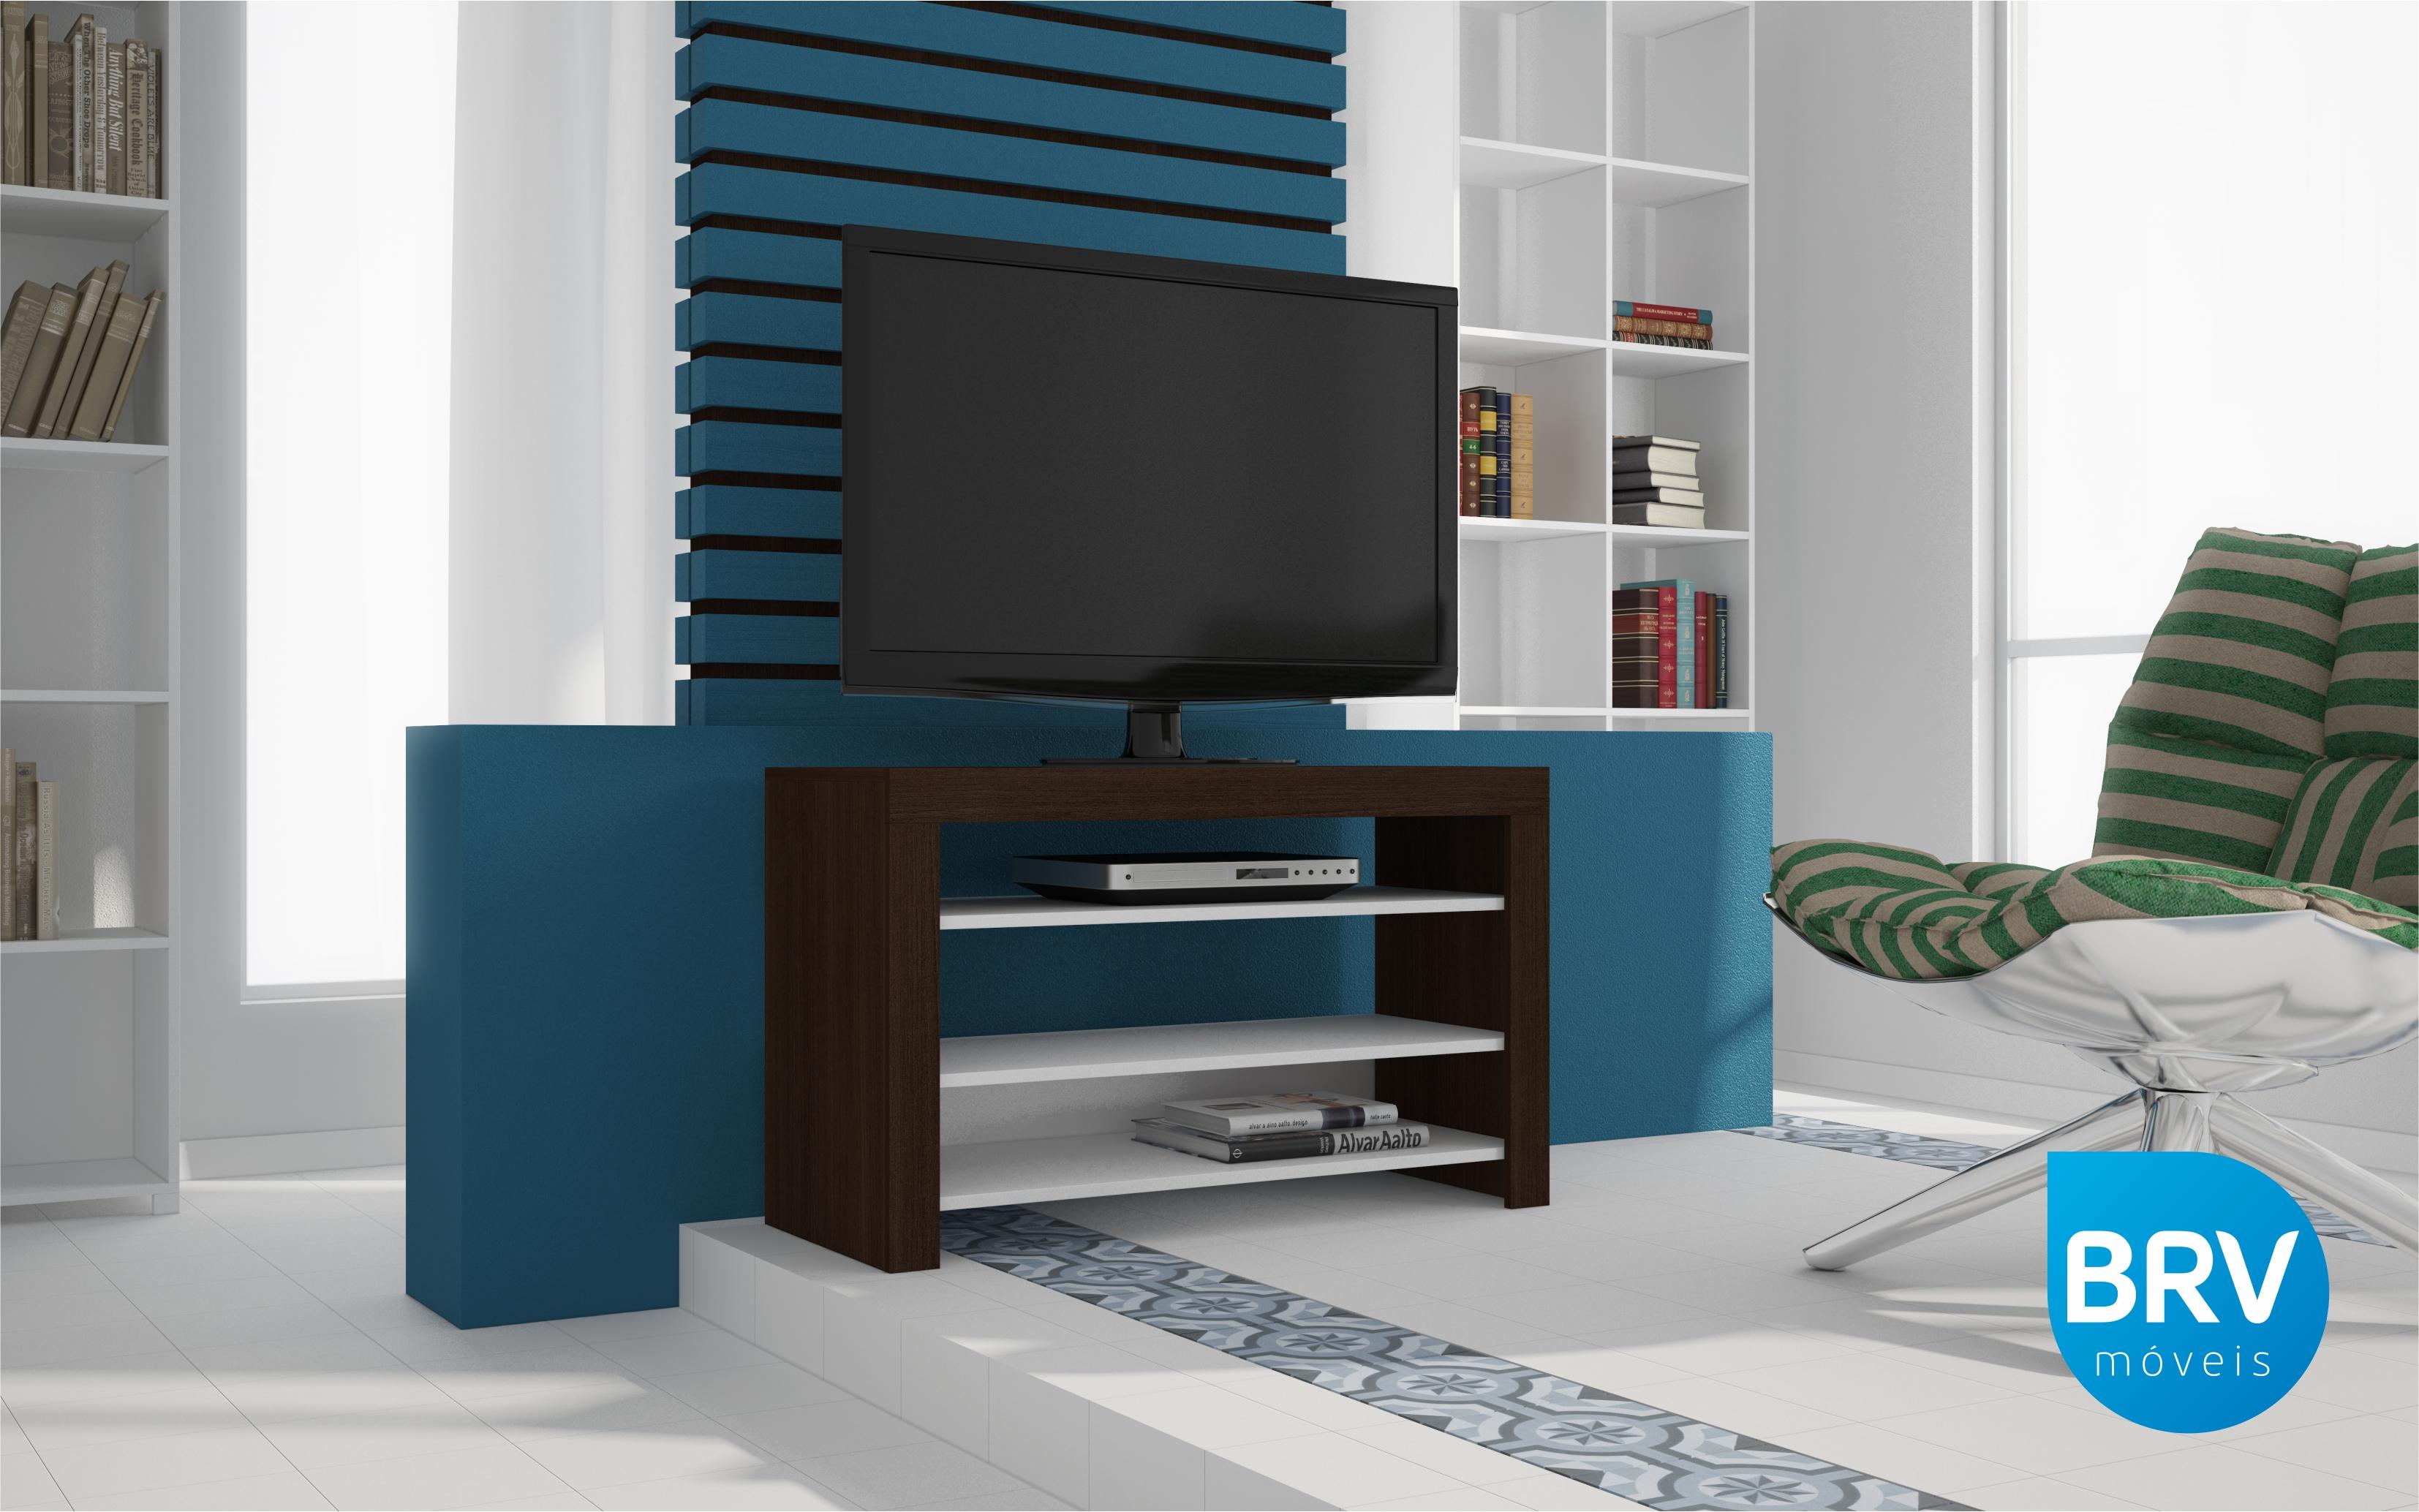 Mueble Para Pantalla Tv Modelo Br 22 Labnash # Muebles Tasa Cero